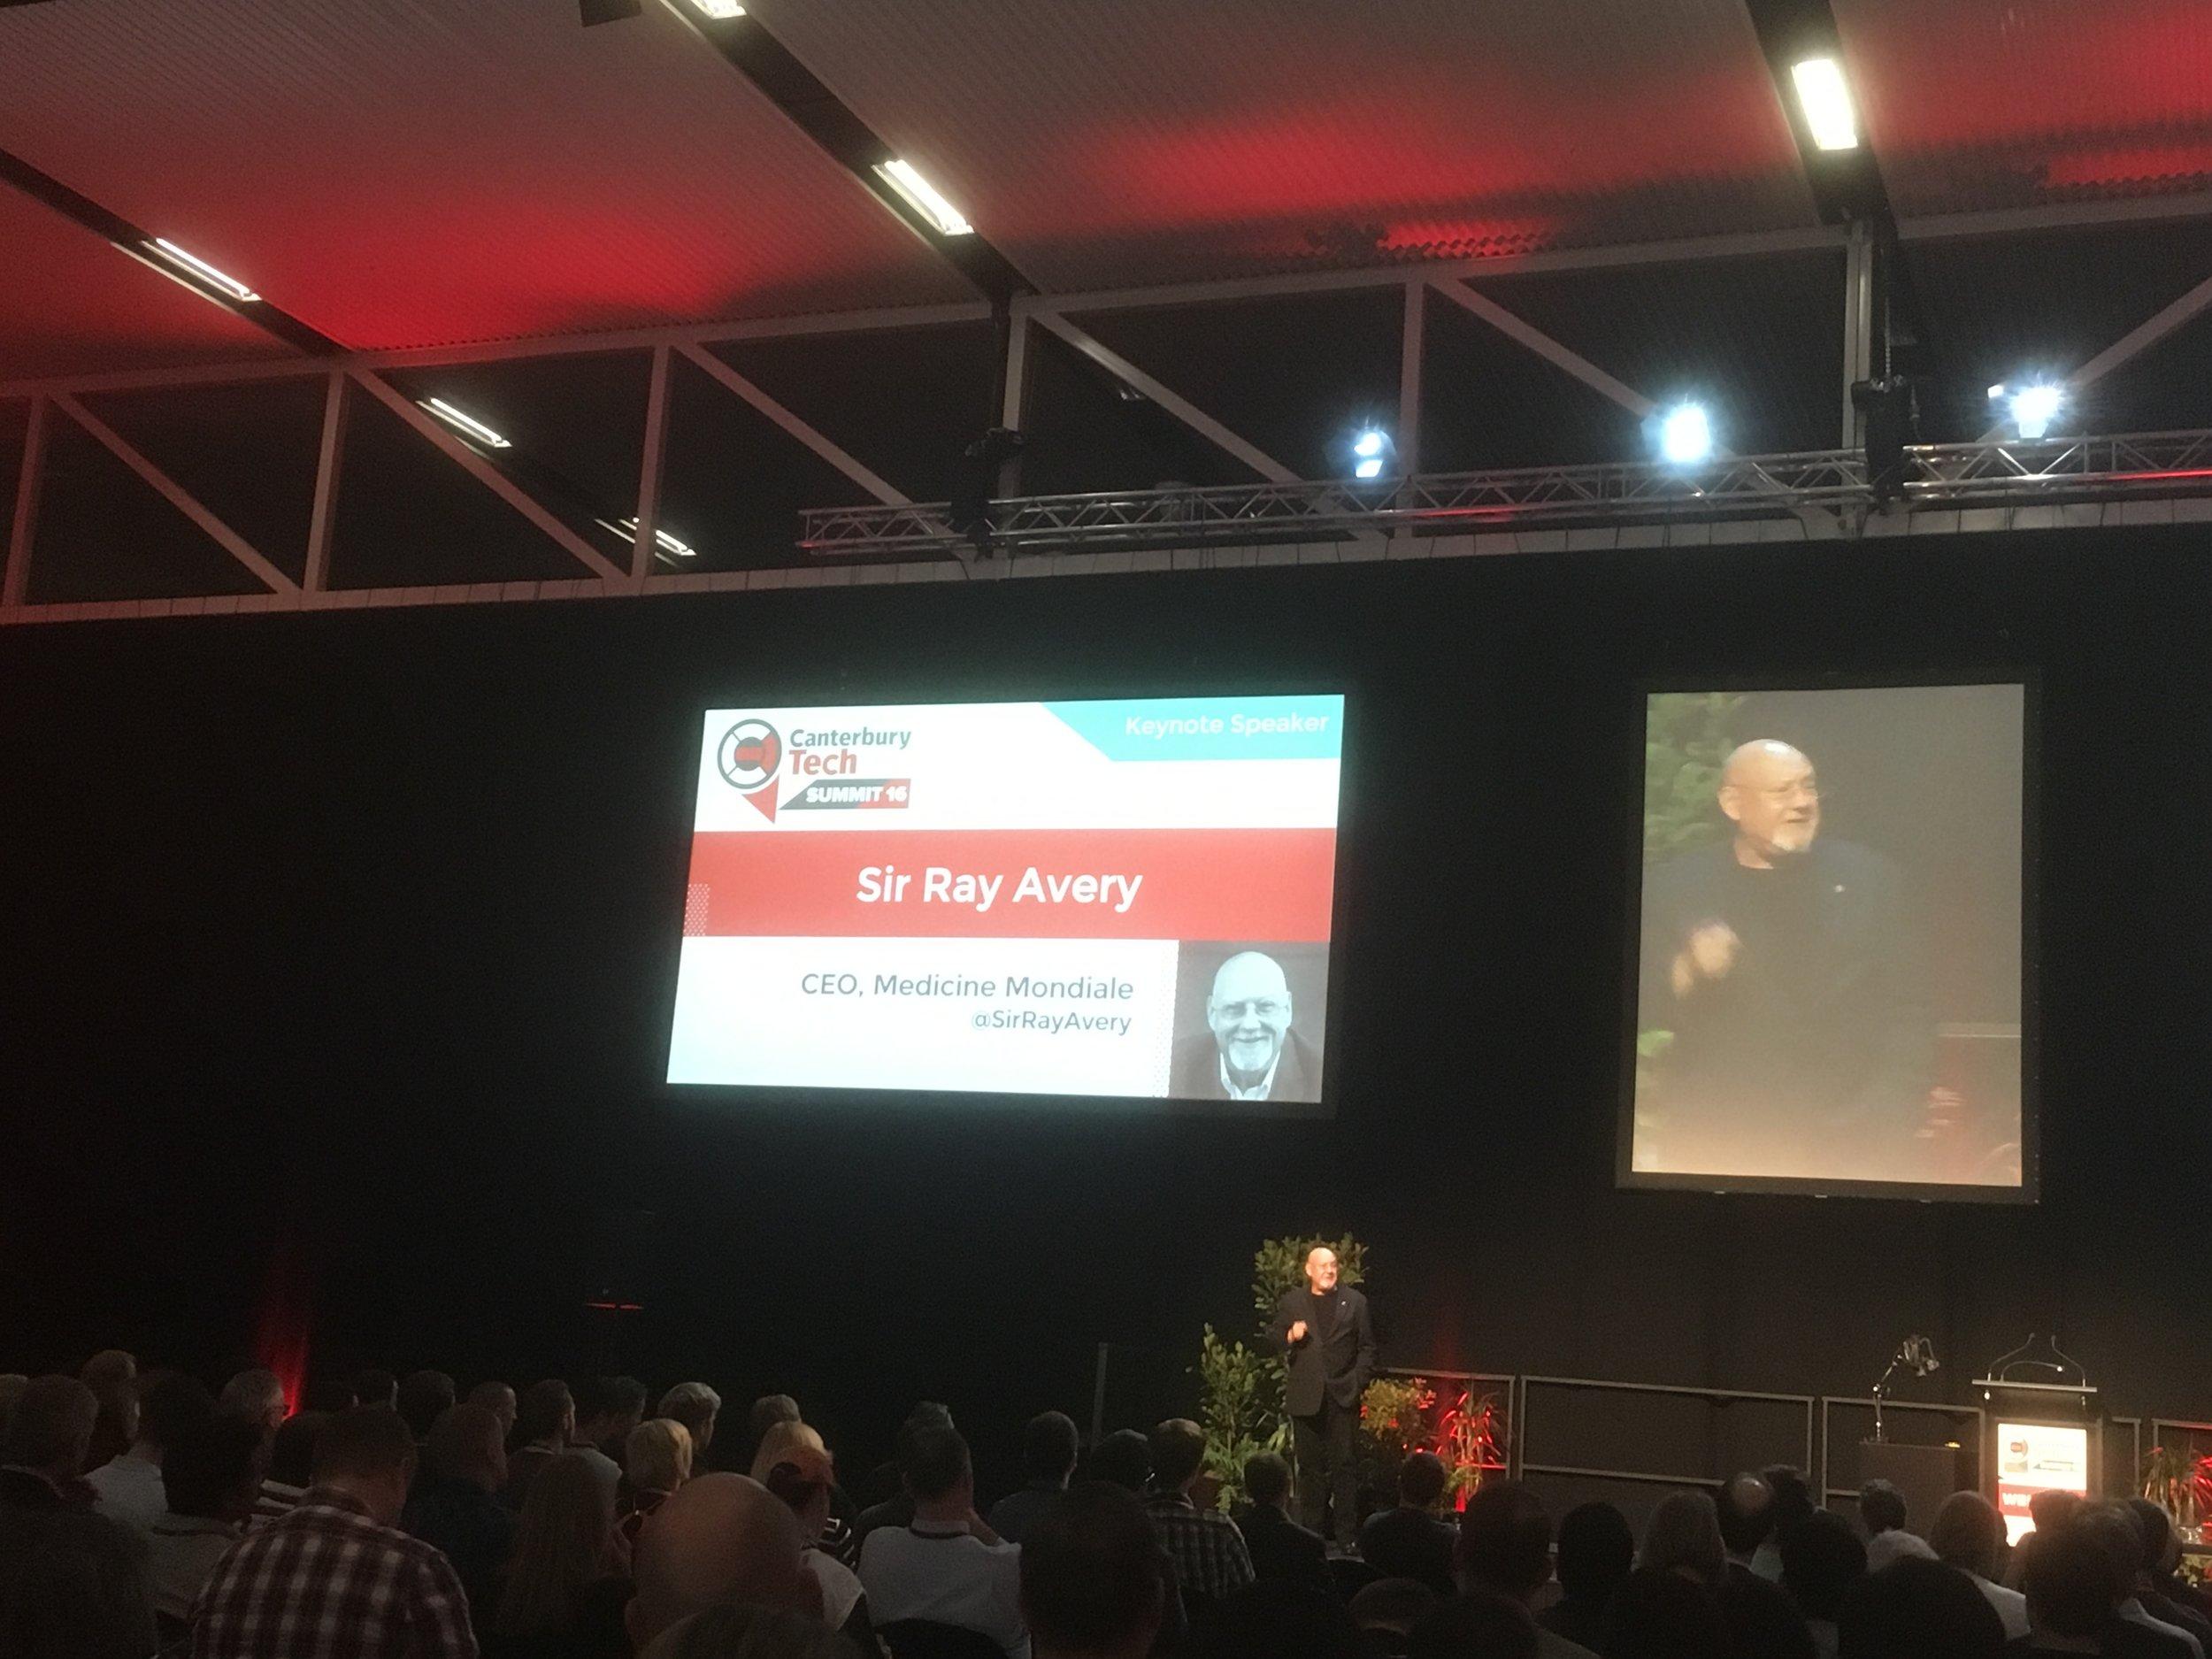 Sir Ray Avery keynote speaker photo by sunstone